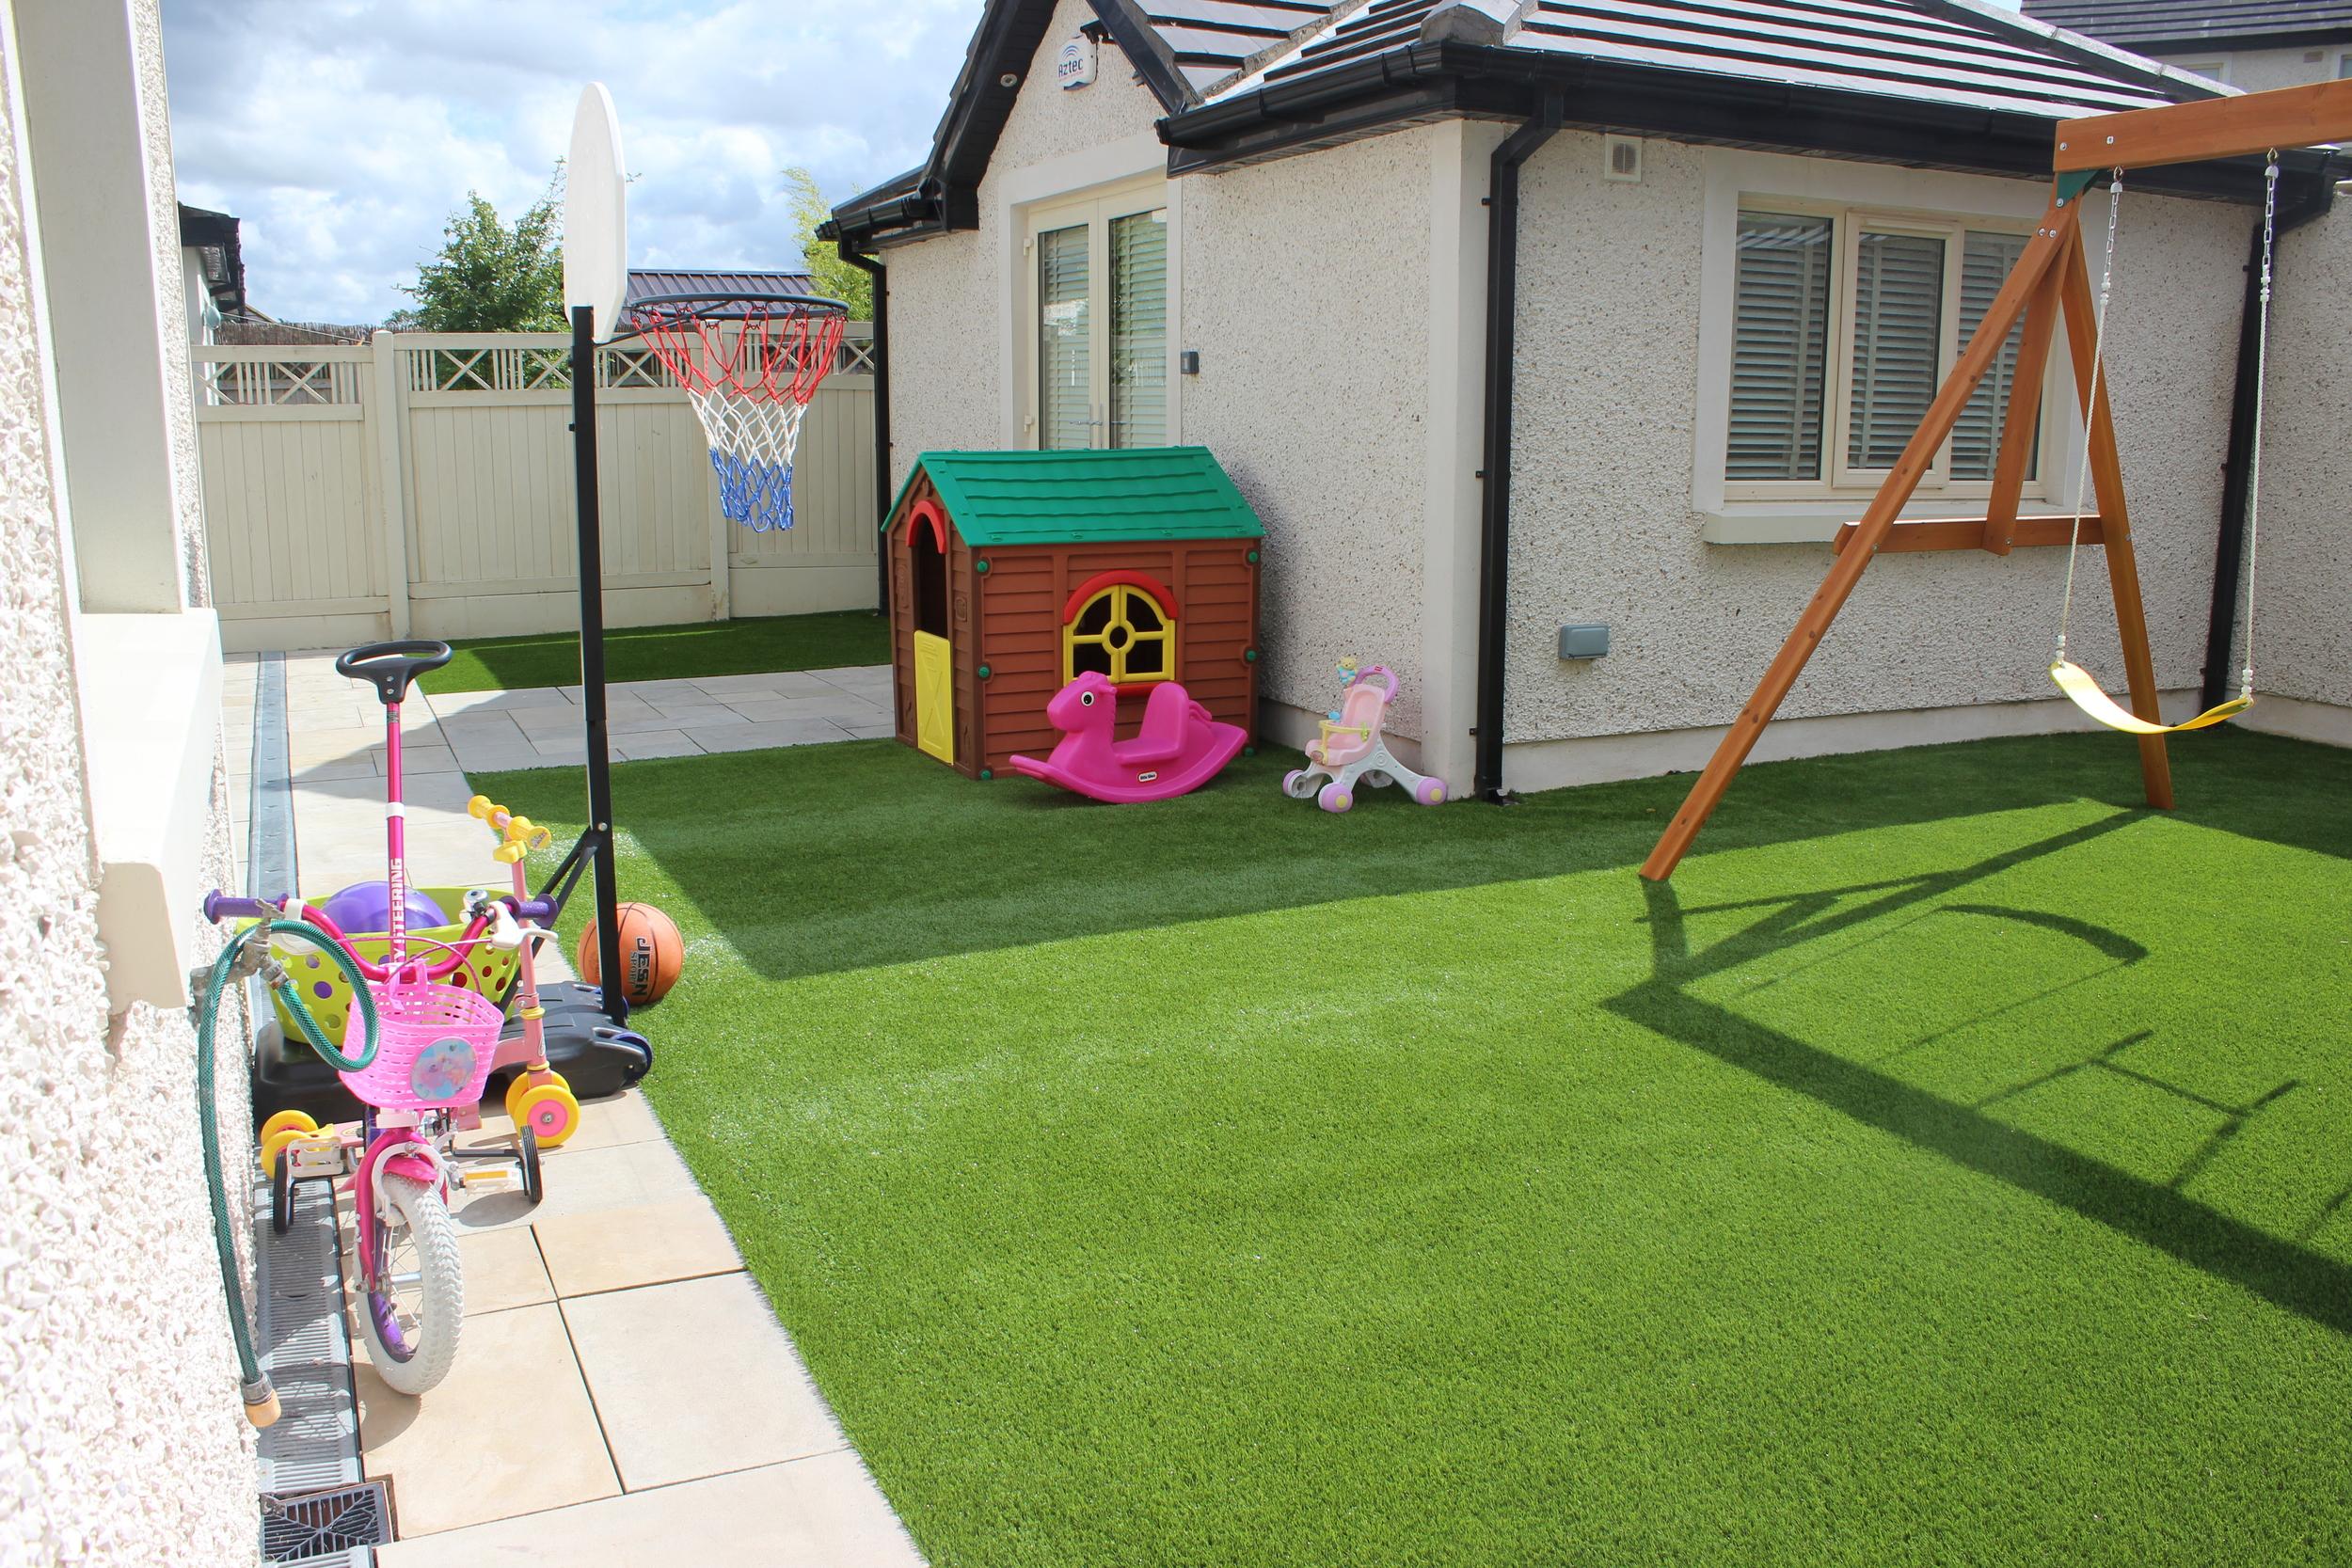 TigerTurf Astroturf Family lawn